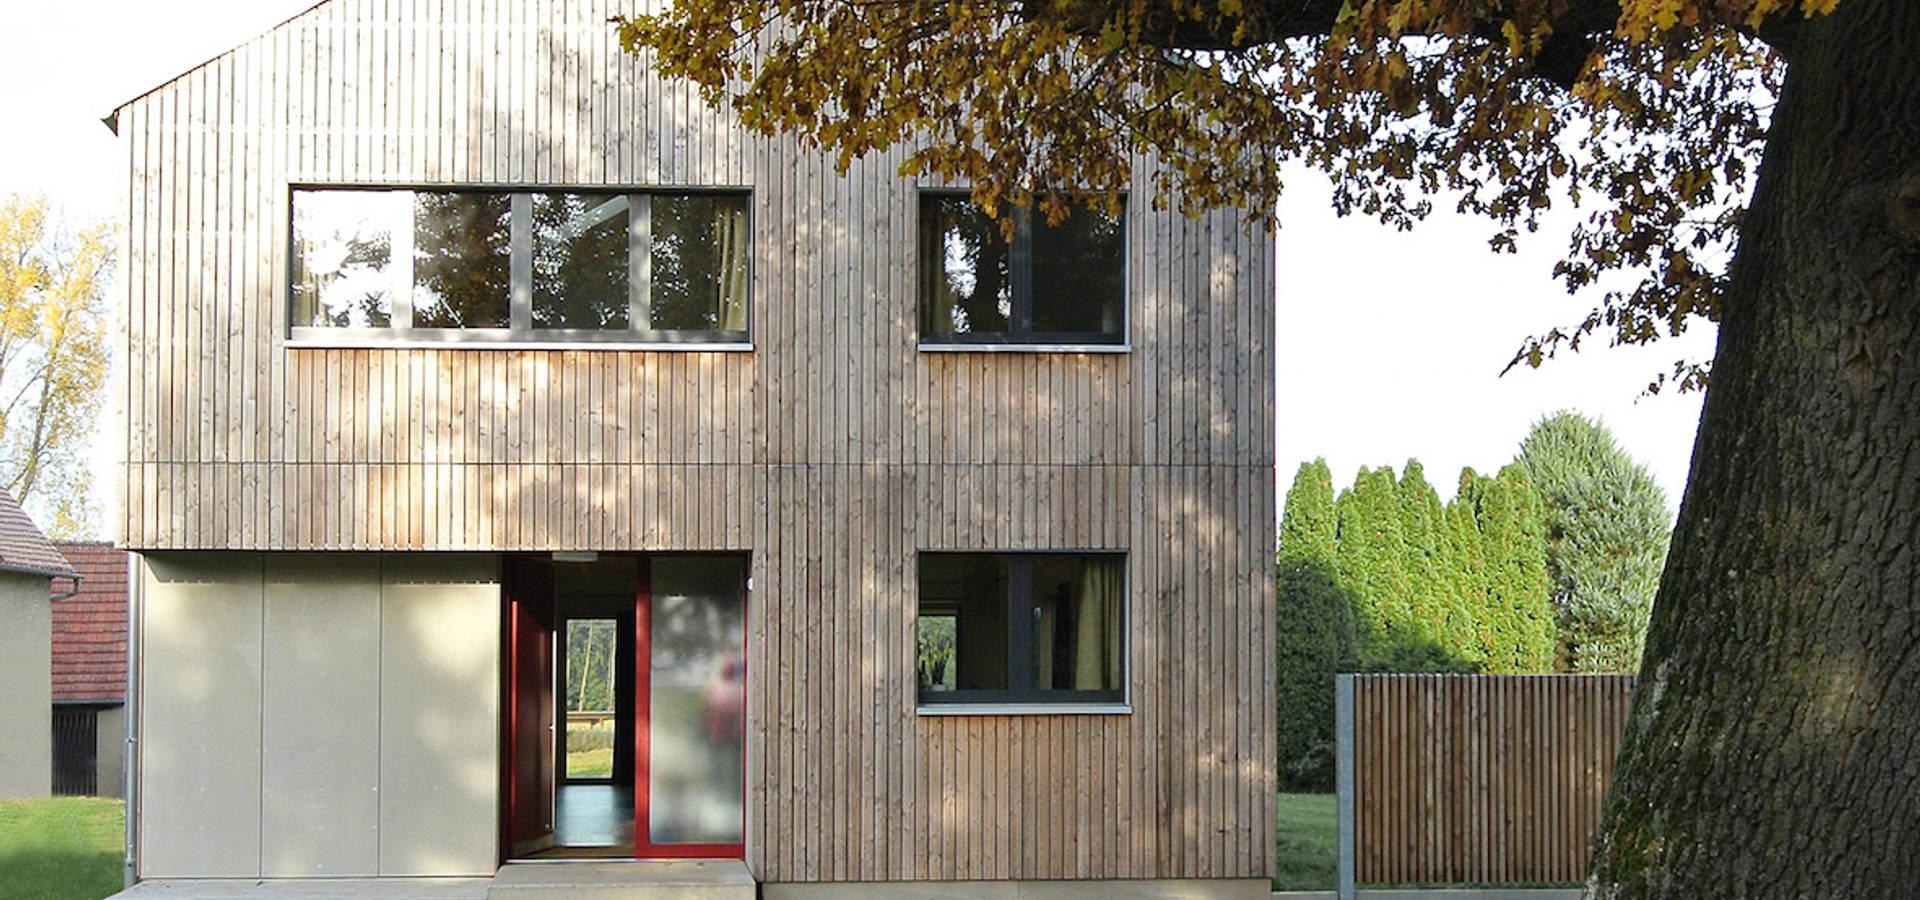 VS Volker Schmidt Architekten